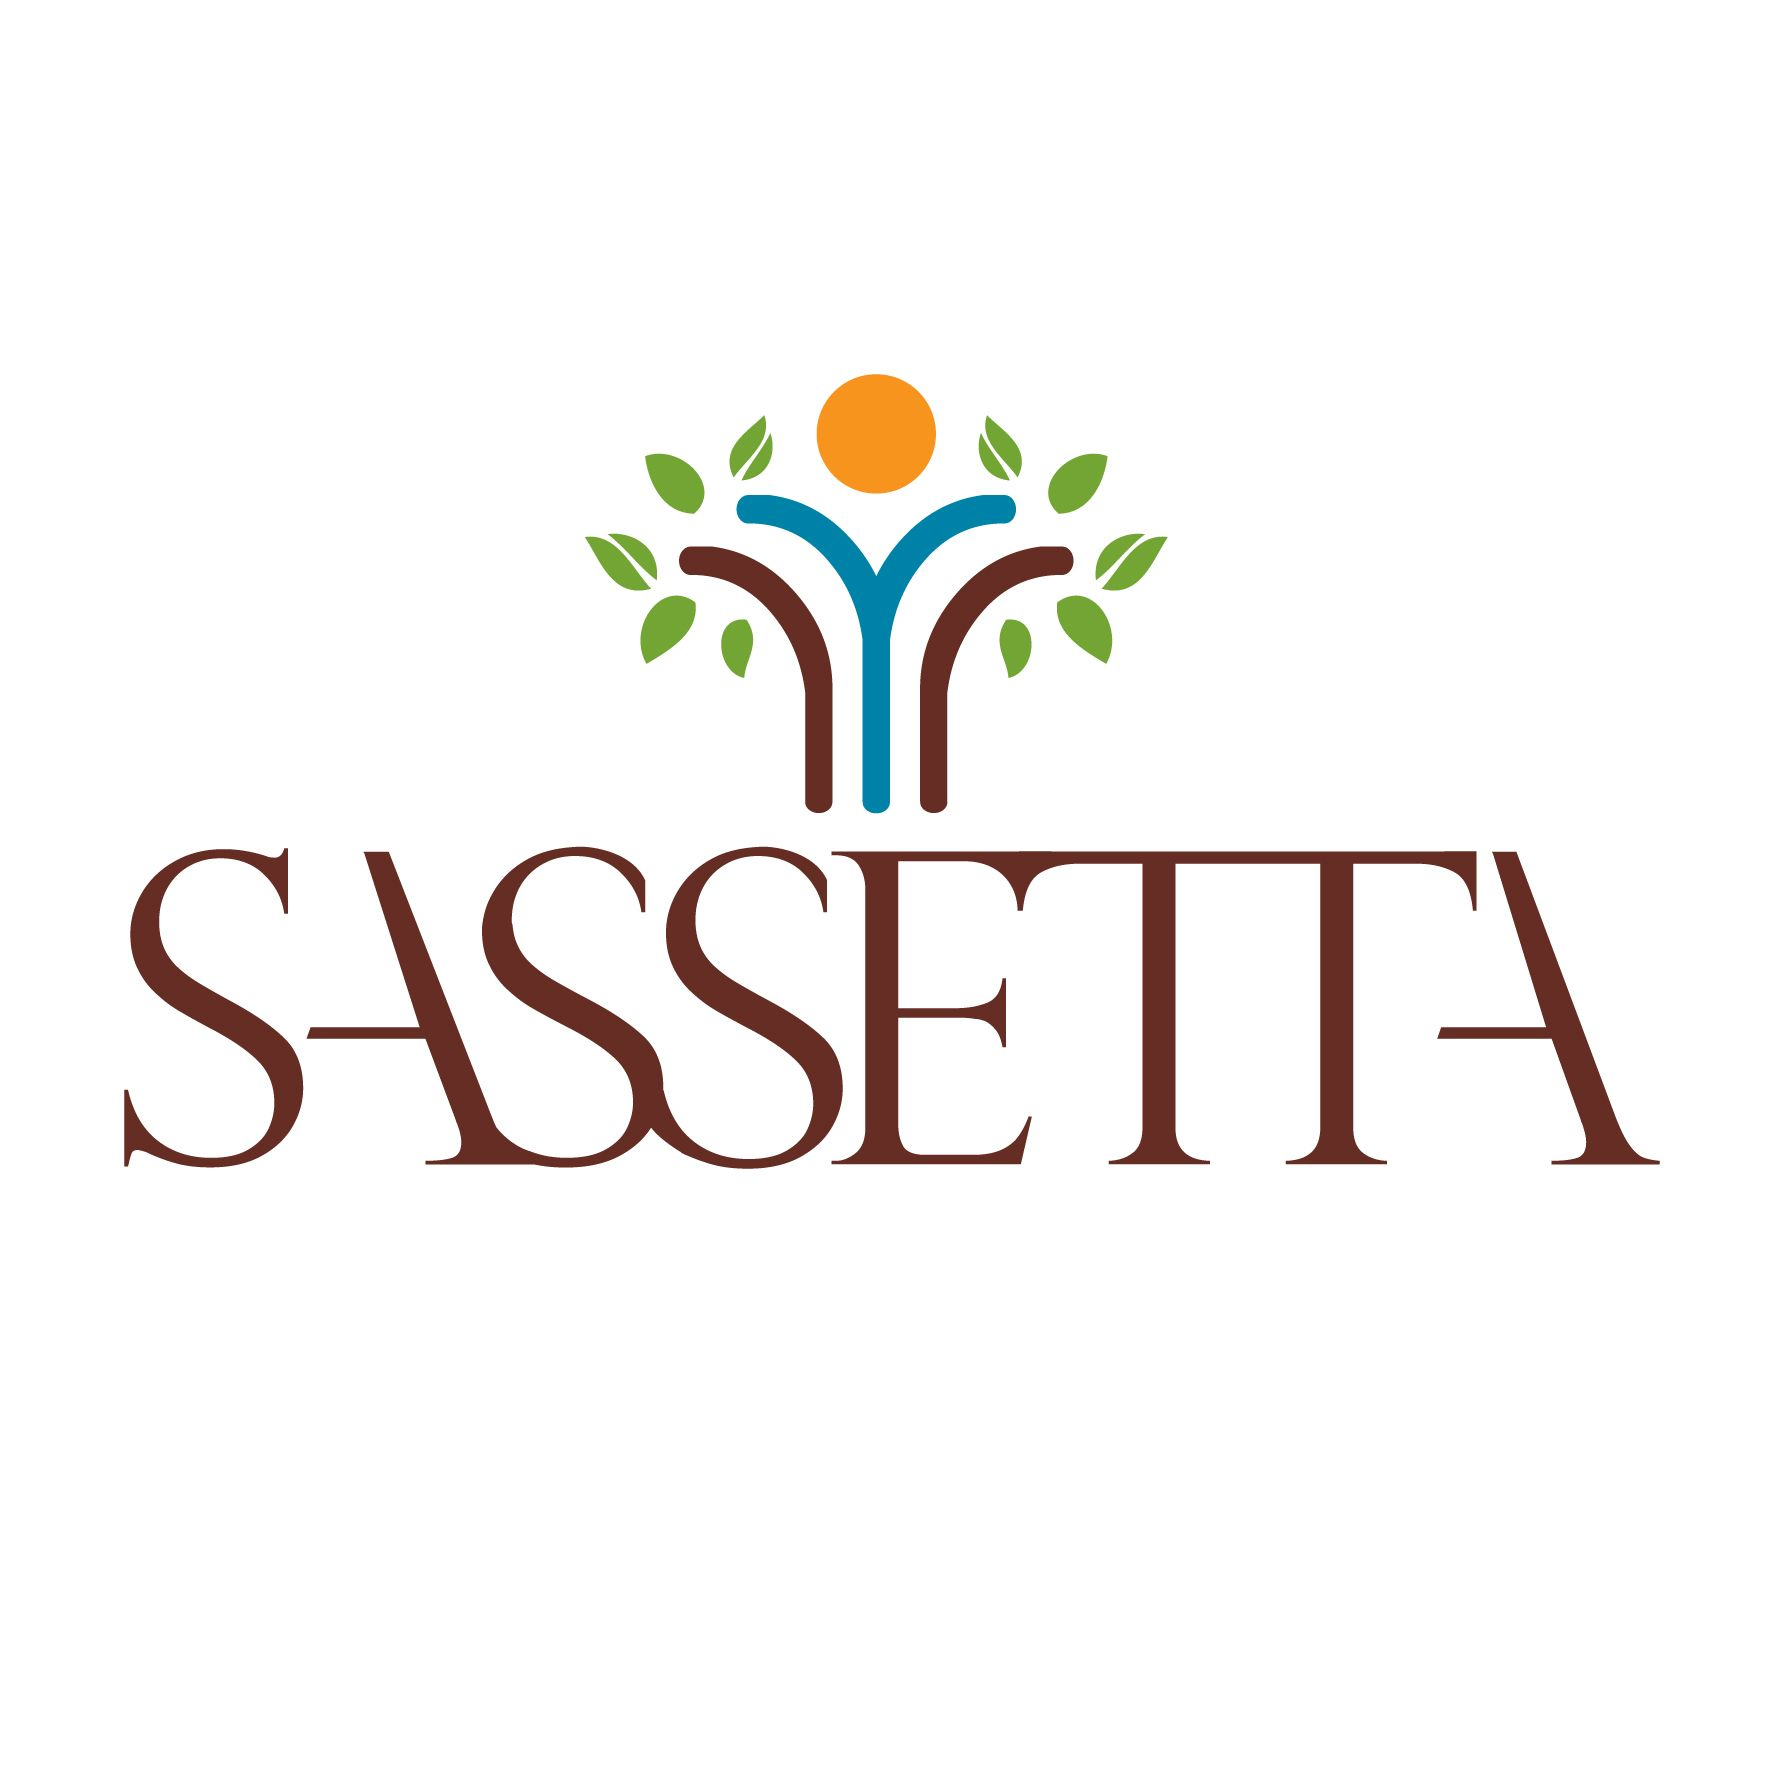 City Brand Sassetta